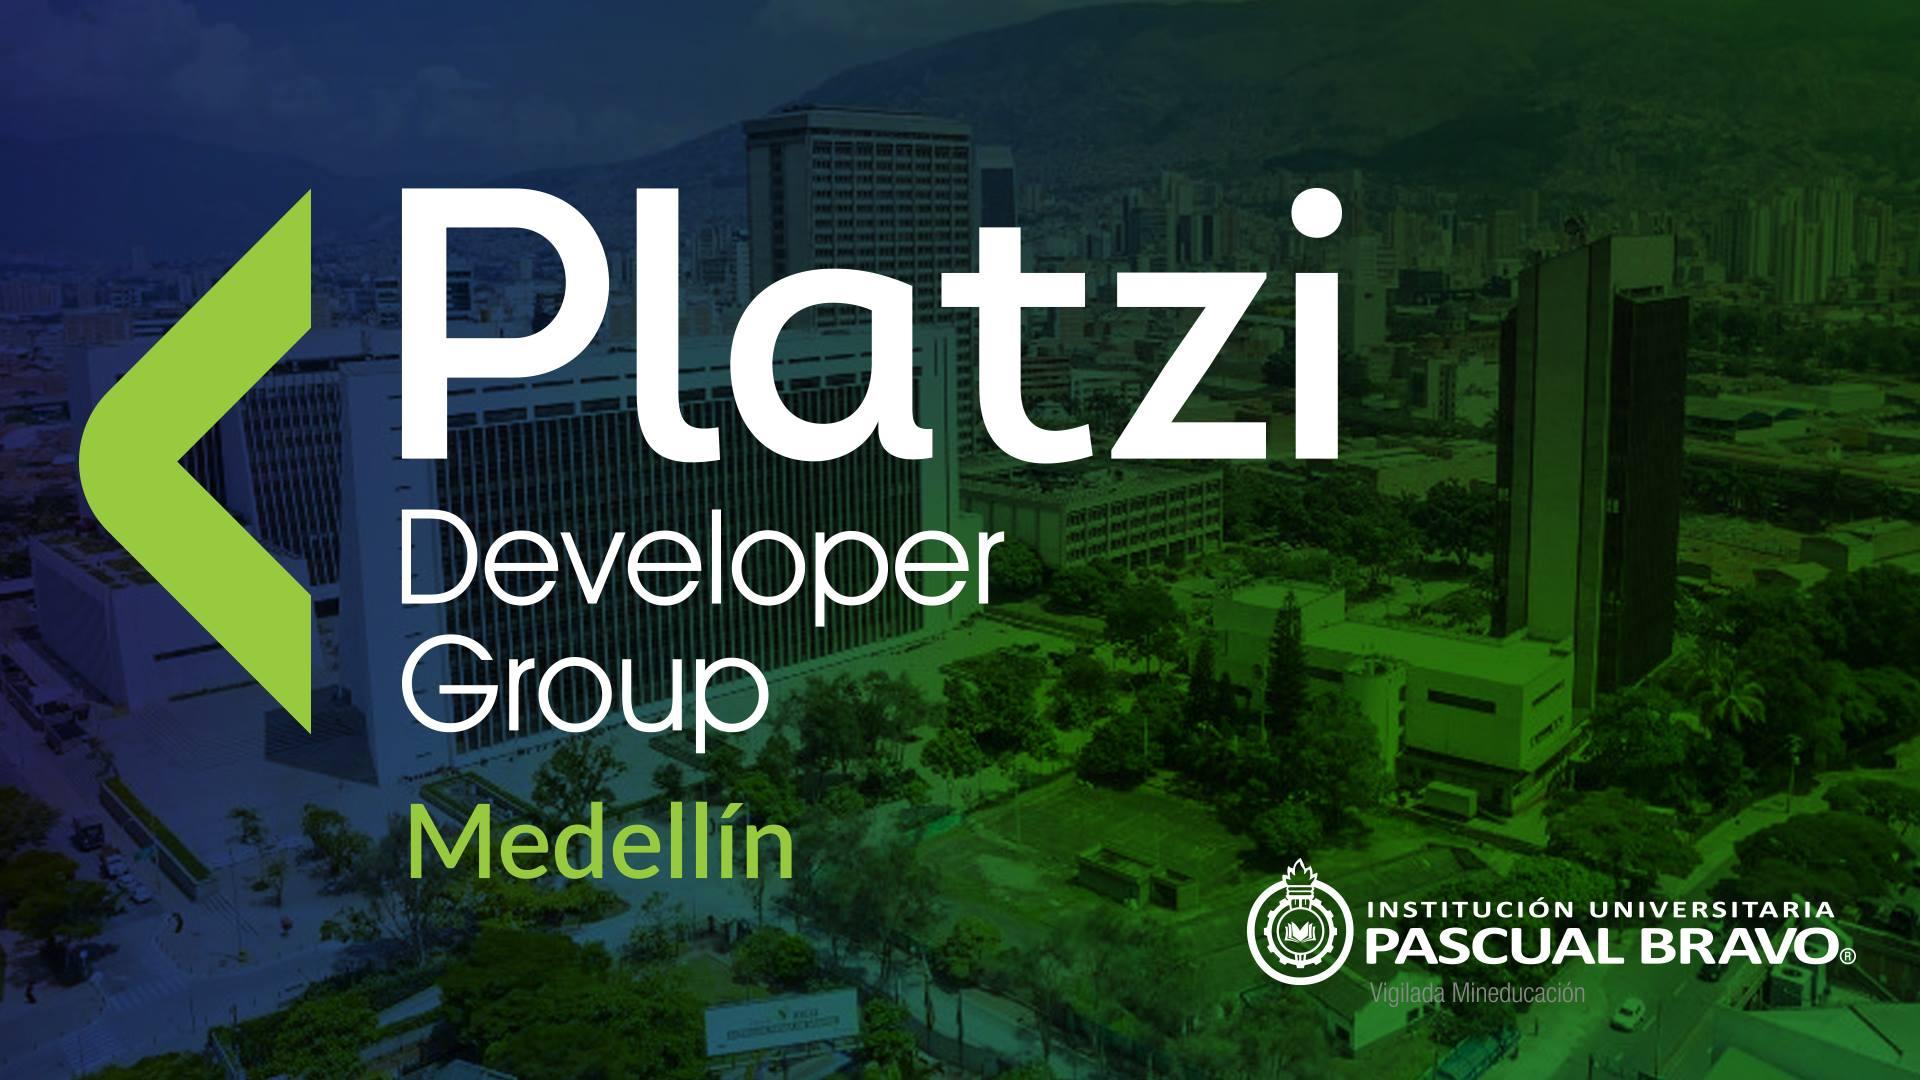 Platzi Developer Group Medellin : JavaScript de cara al 2019